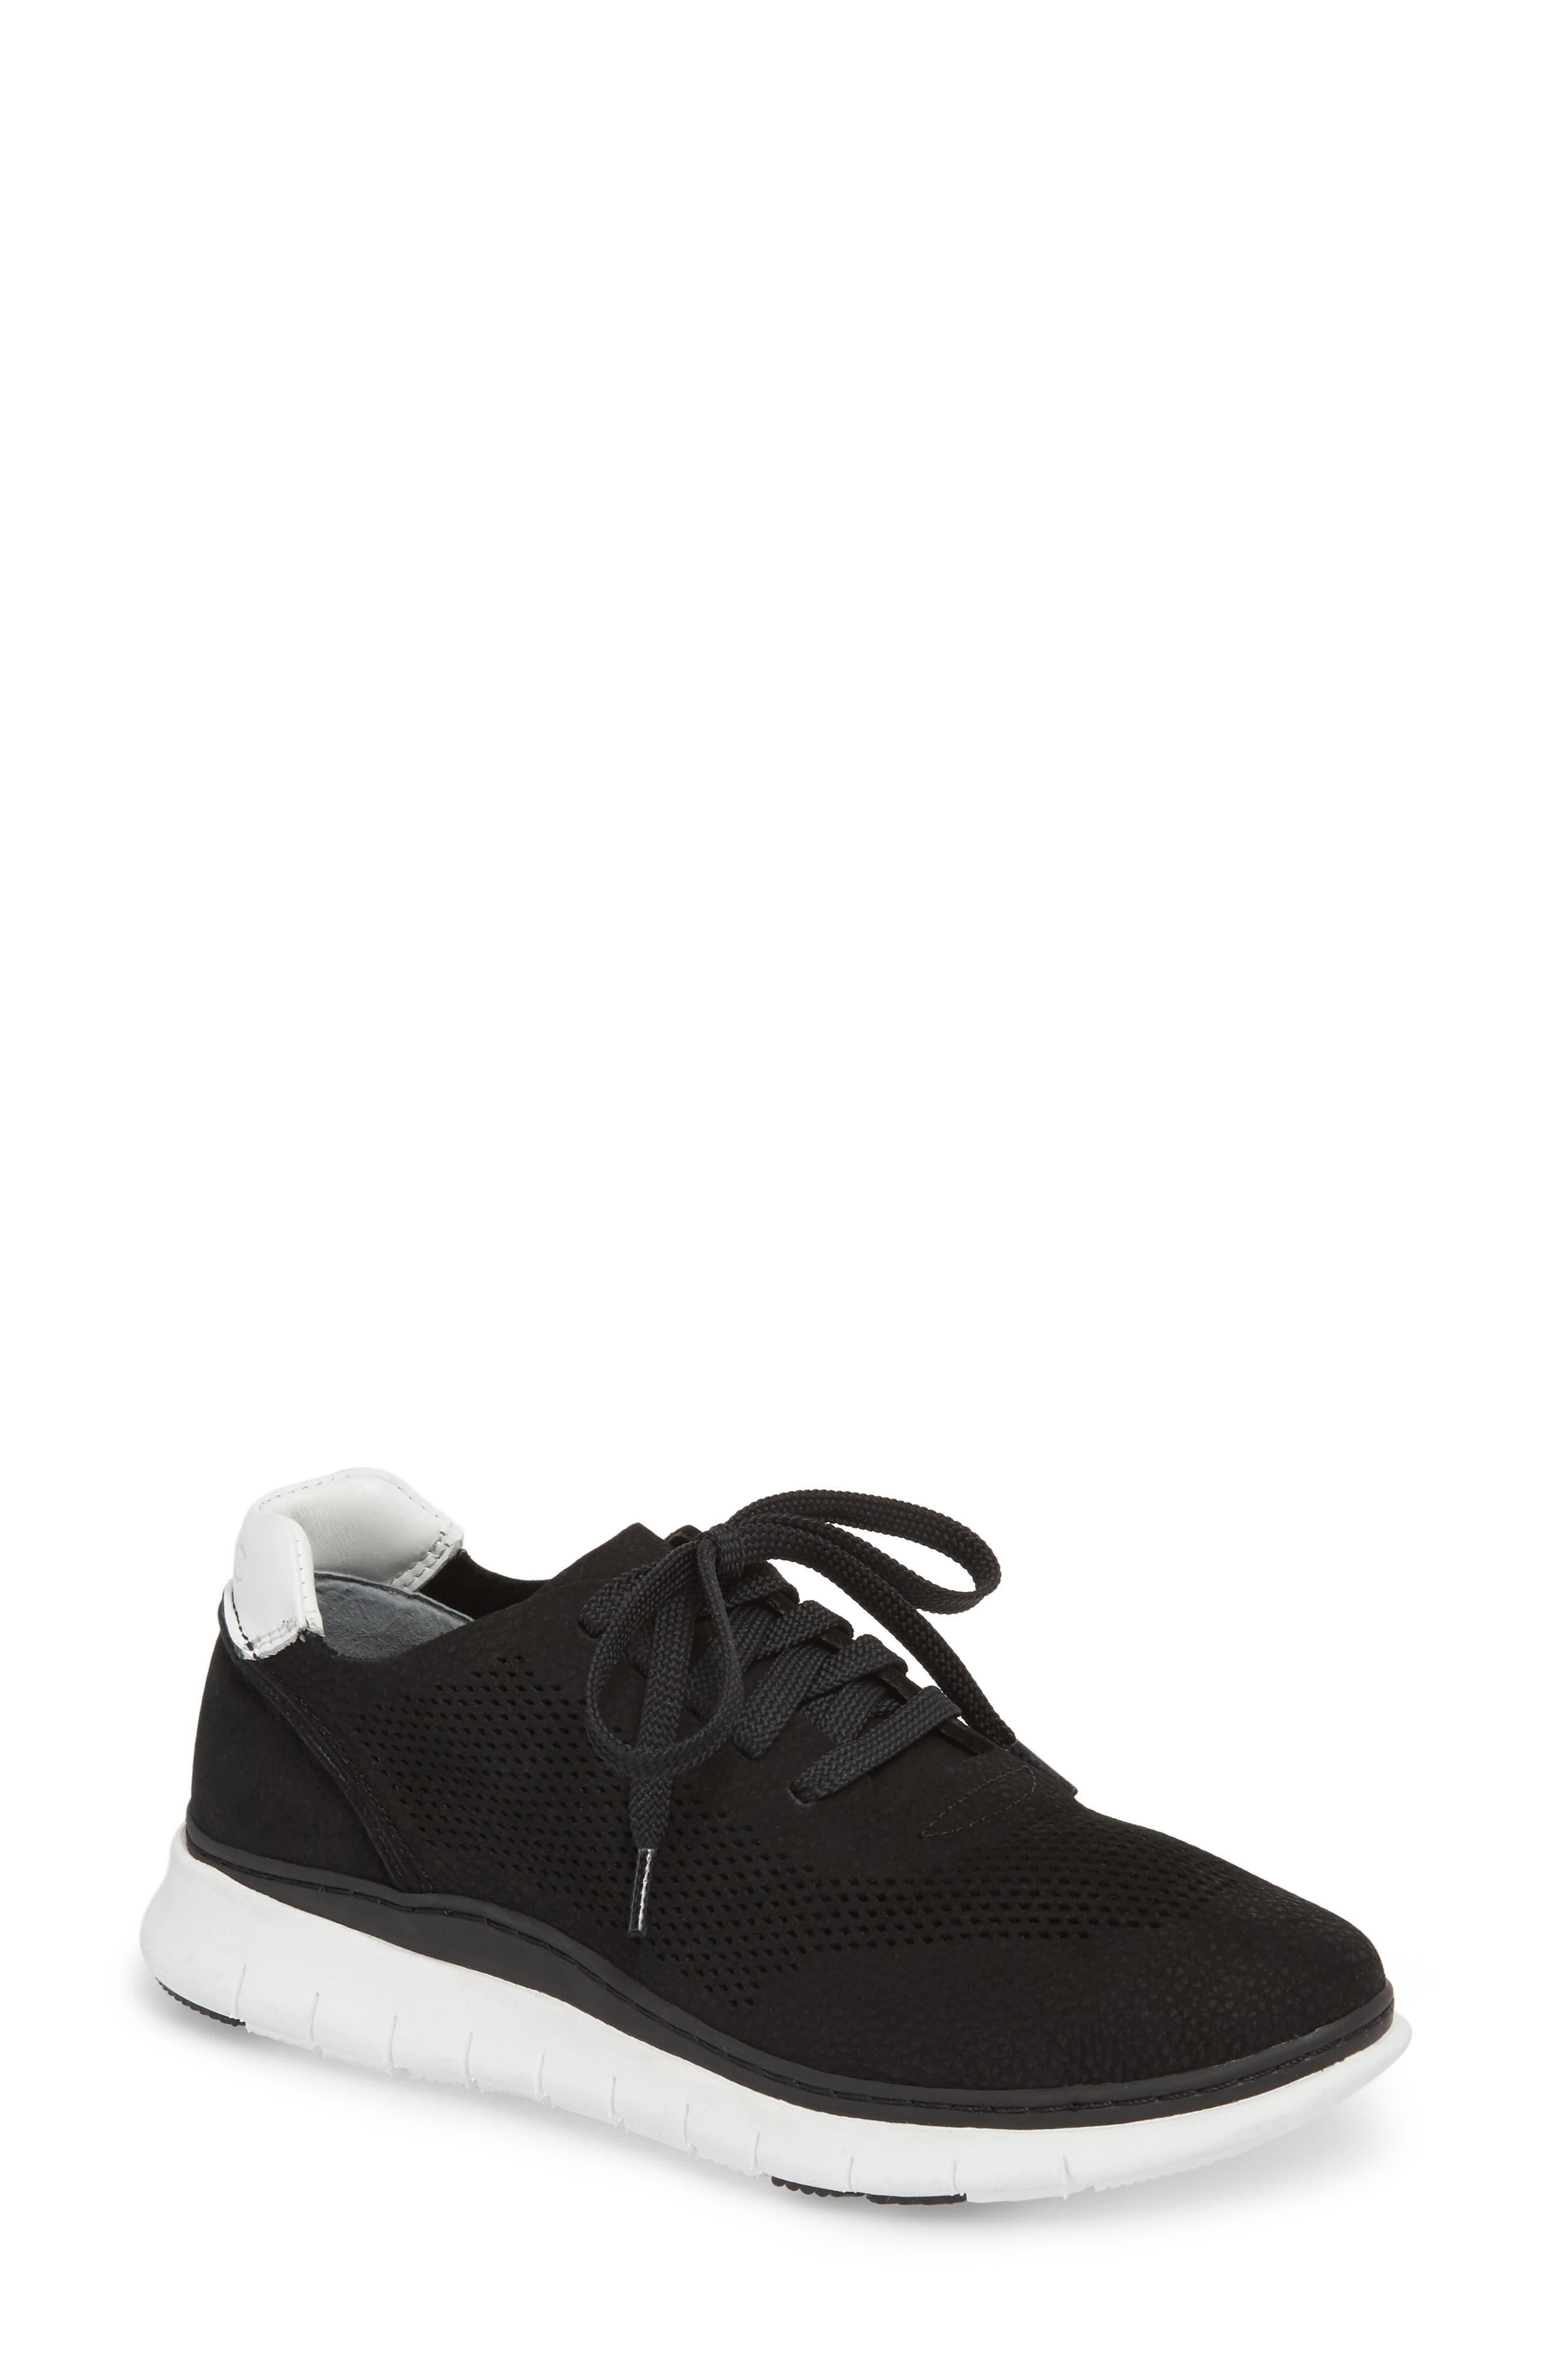 Joey Sneaker,                             Main thumbnail 1, color,                             BLACK NUBUCK LEATHER